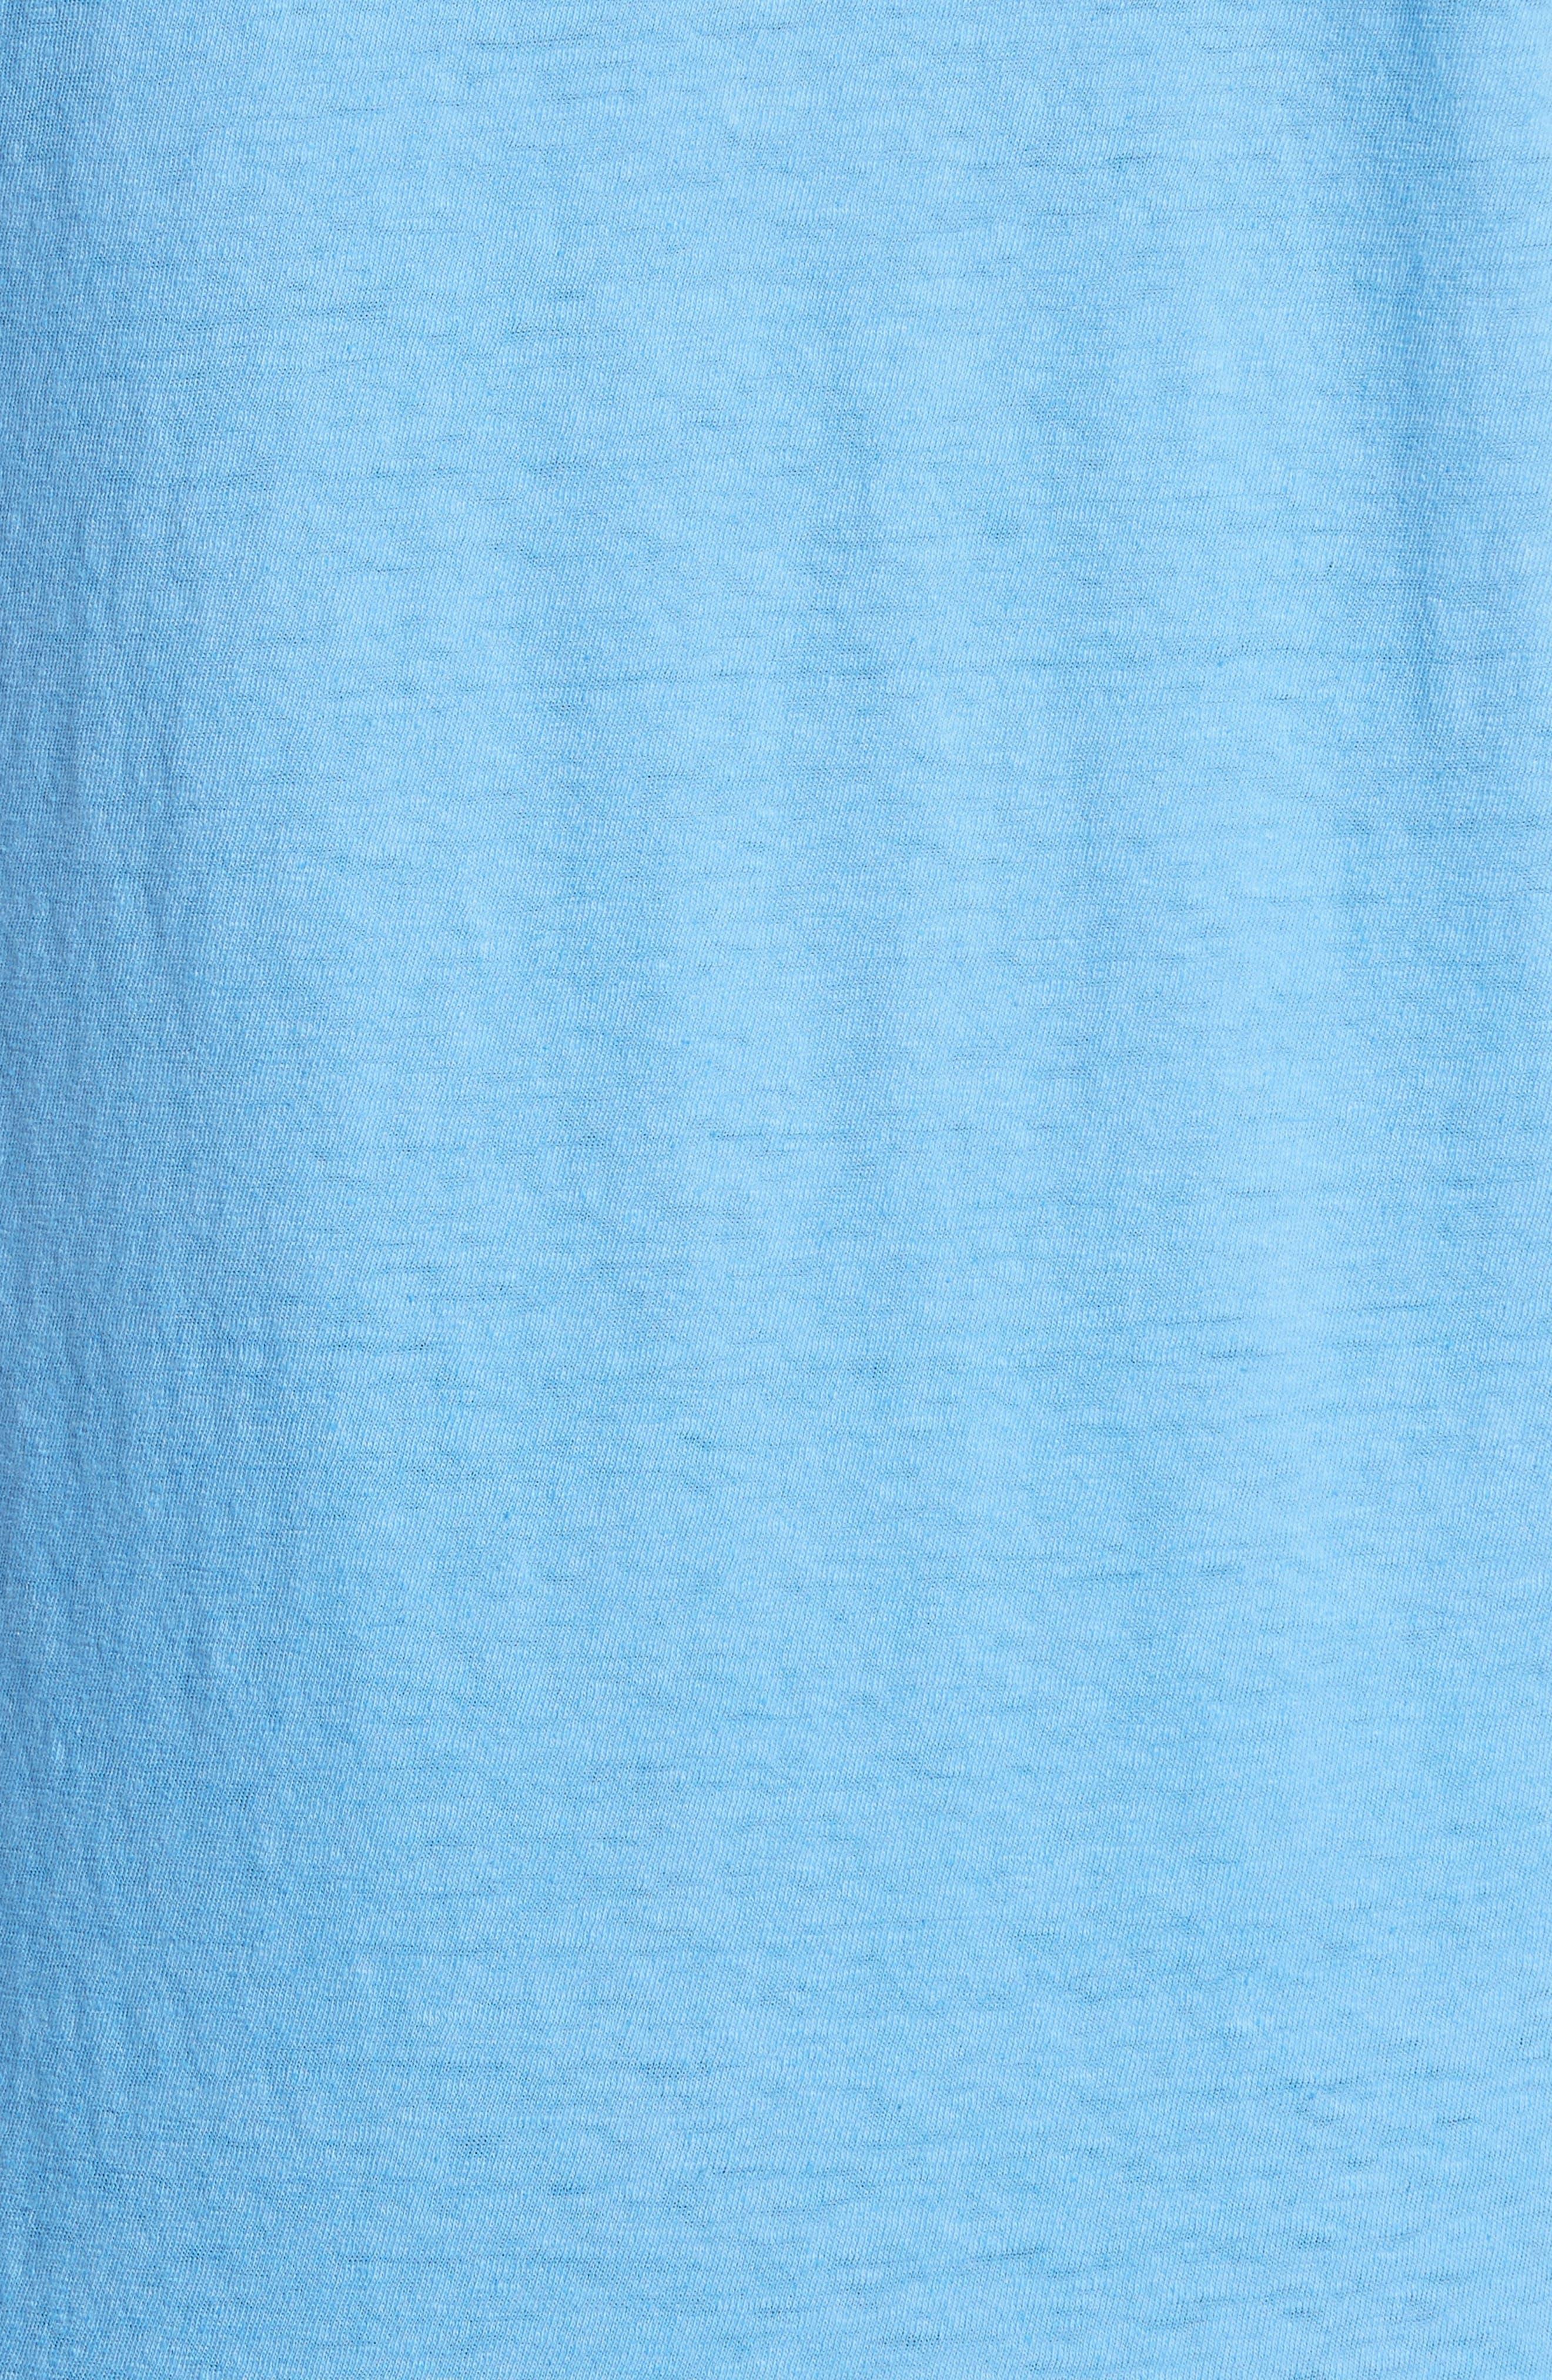 Dquared2 Cotton T-Shirt,                             Alternate thumbnail 5, color,                             449